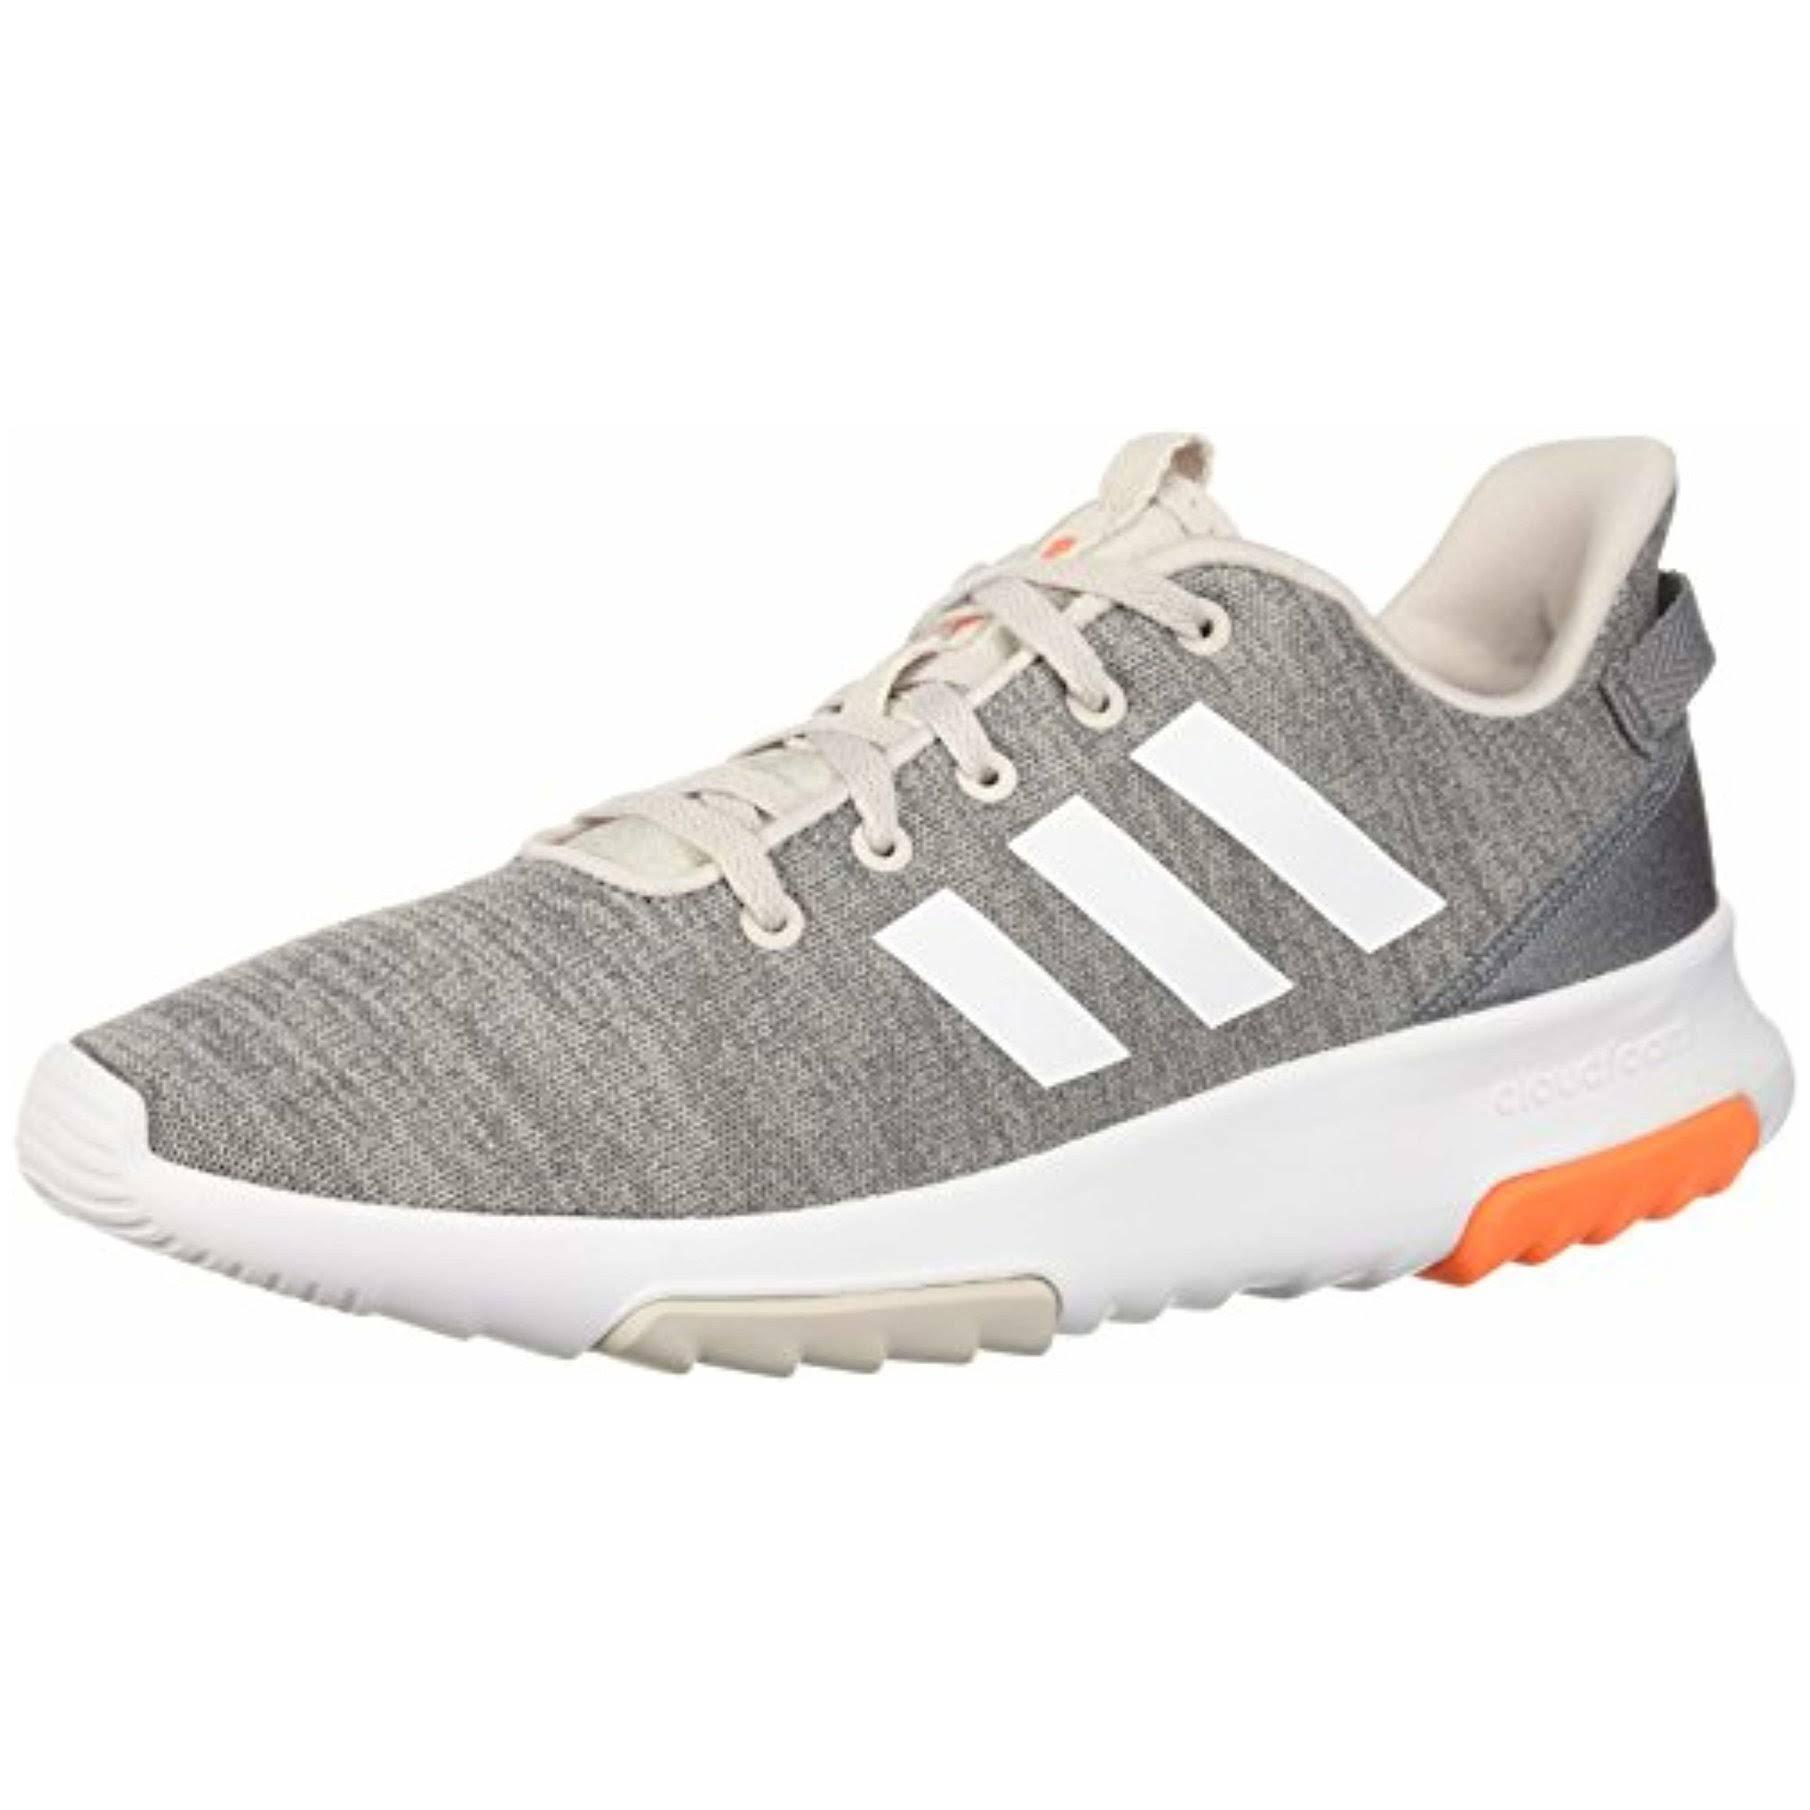 Adidas Kid Cf Kid little Big Tr Sneaker Racer amp; Athletic TxAqgwT61